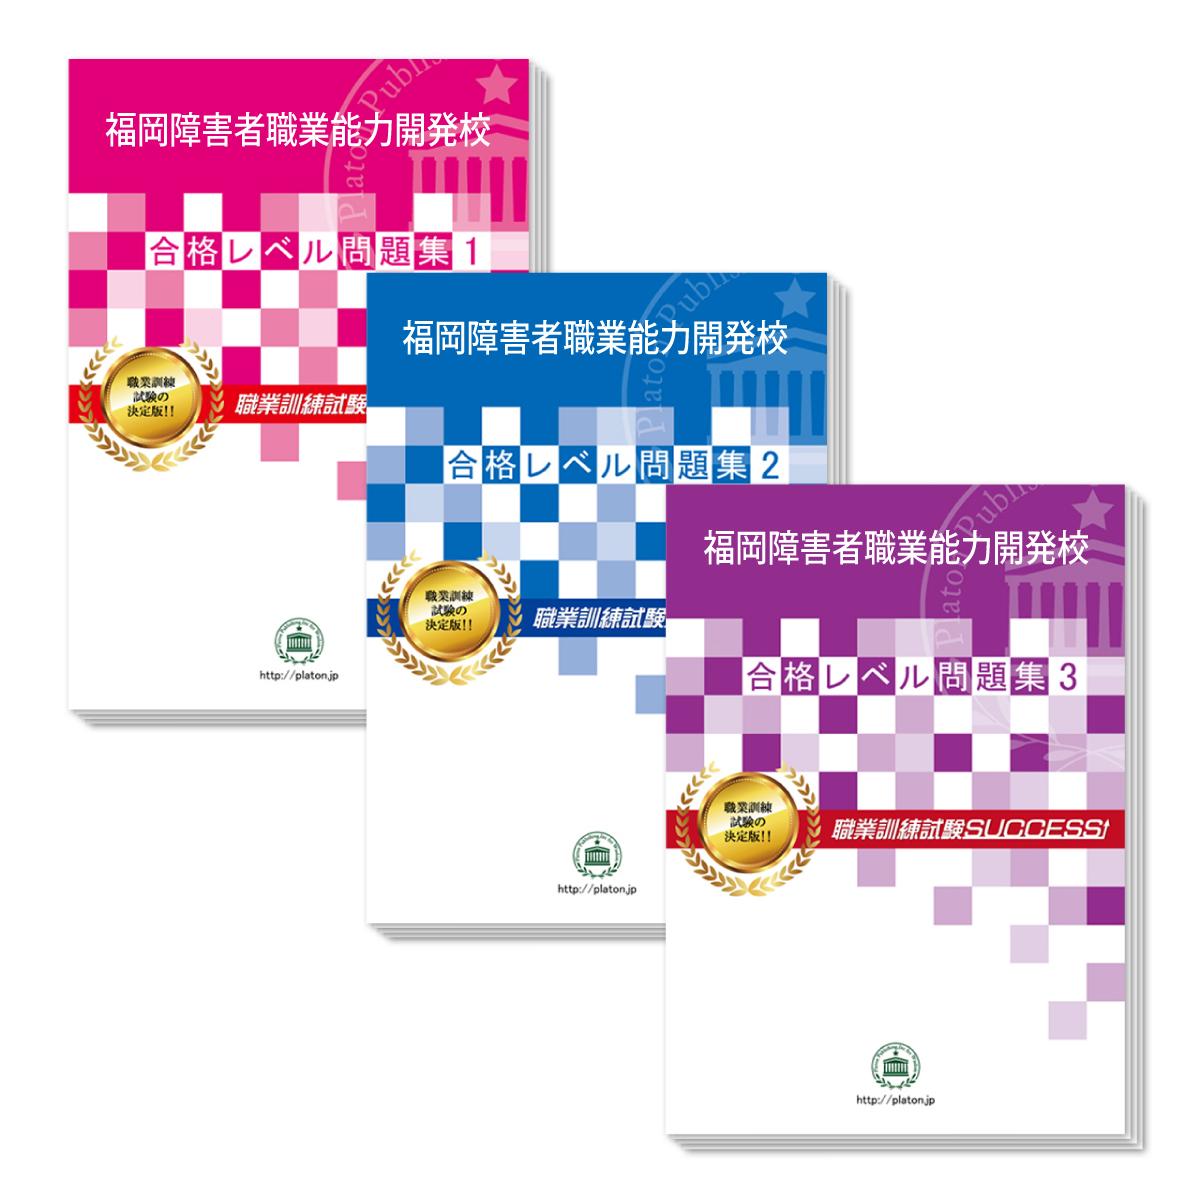 蔵 送料 代引手数料無料 福岡障害者職業能力開発校 受験合格セット問題集 3冊 メーカー直送